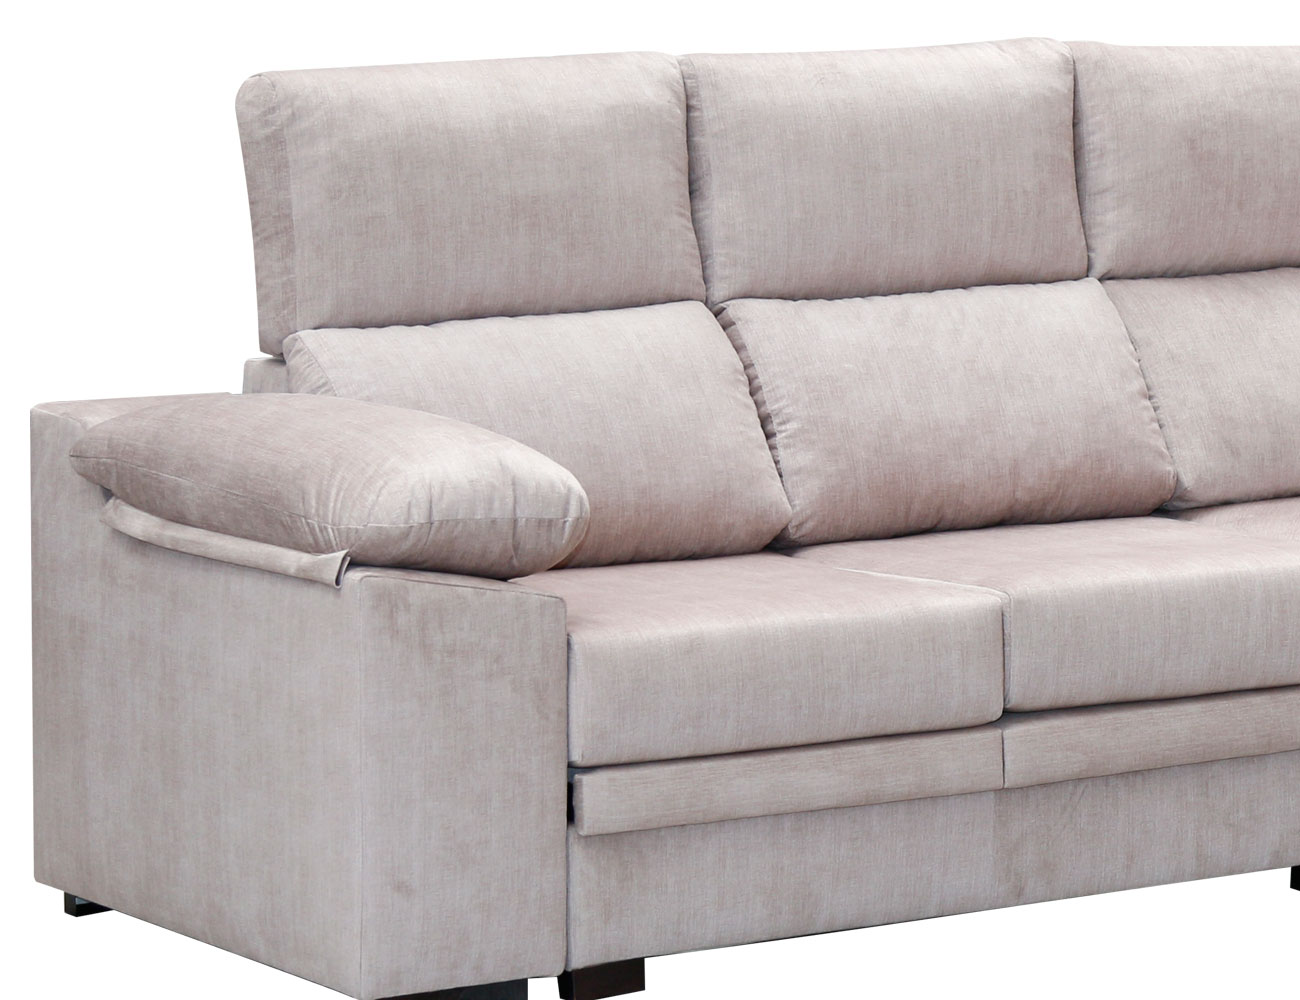 Sofa rincon rinconera beig pufs 3